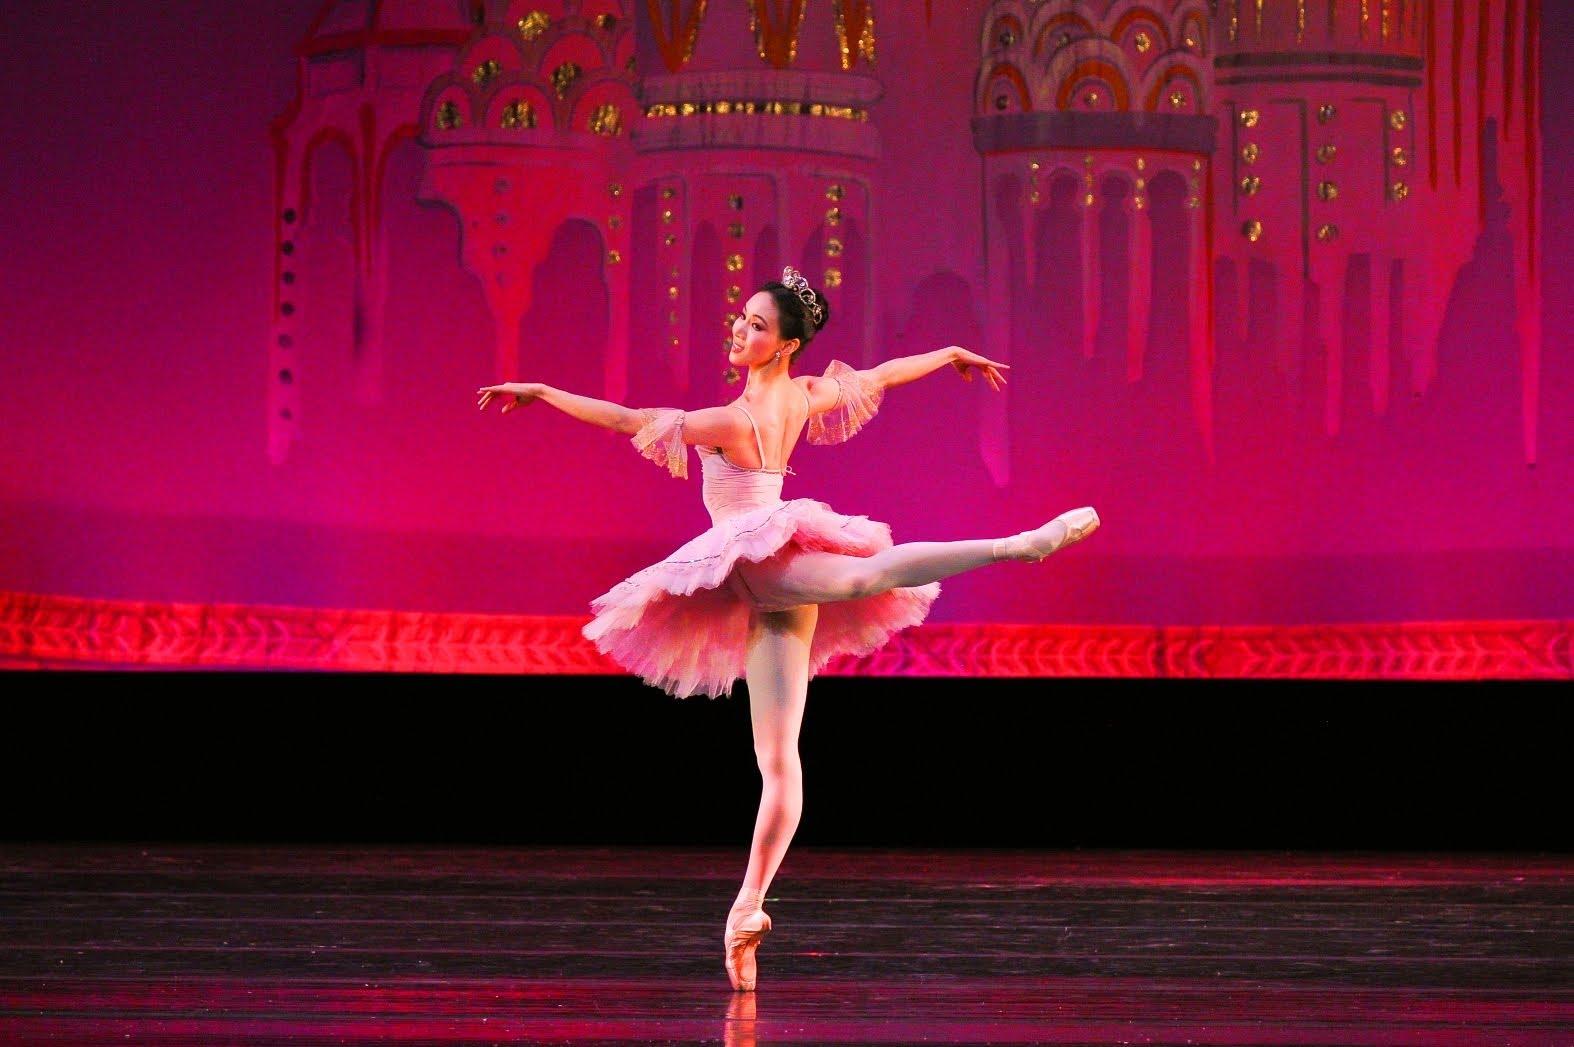 The Sugar Plum fairy in The Nutcracker ballet